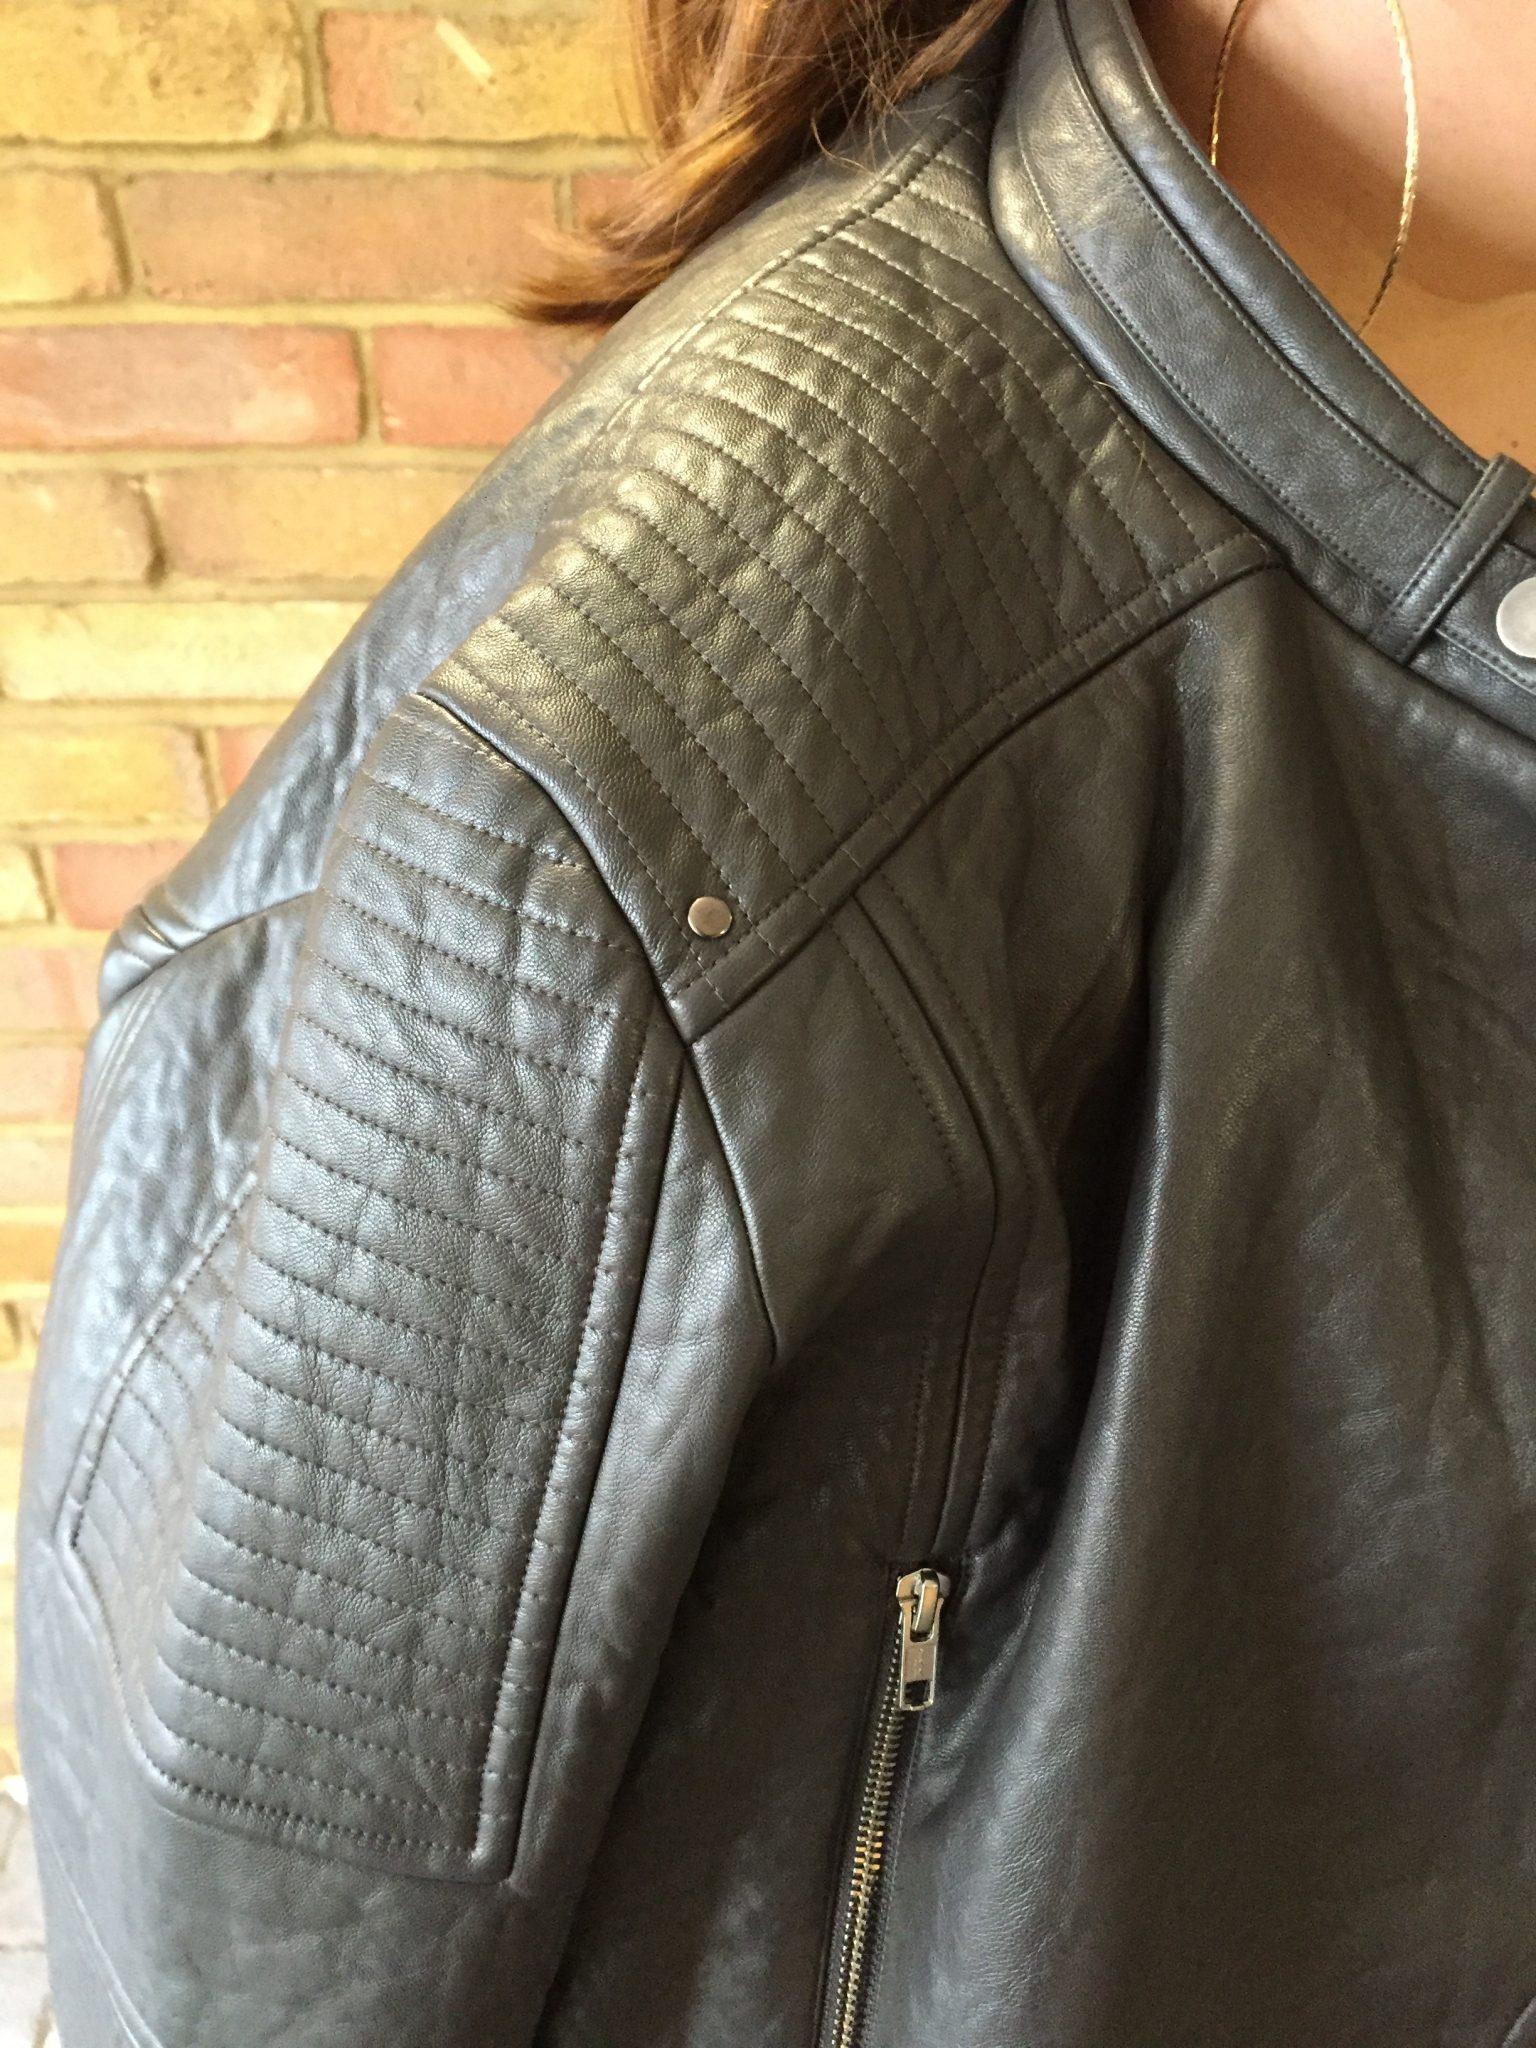 ilvi Leather biker jacket - review - plus size - Pretty big Butterflies